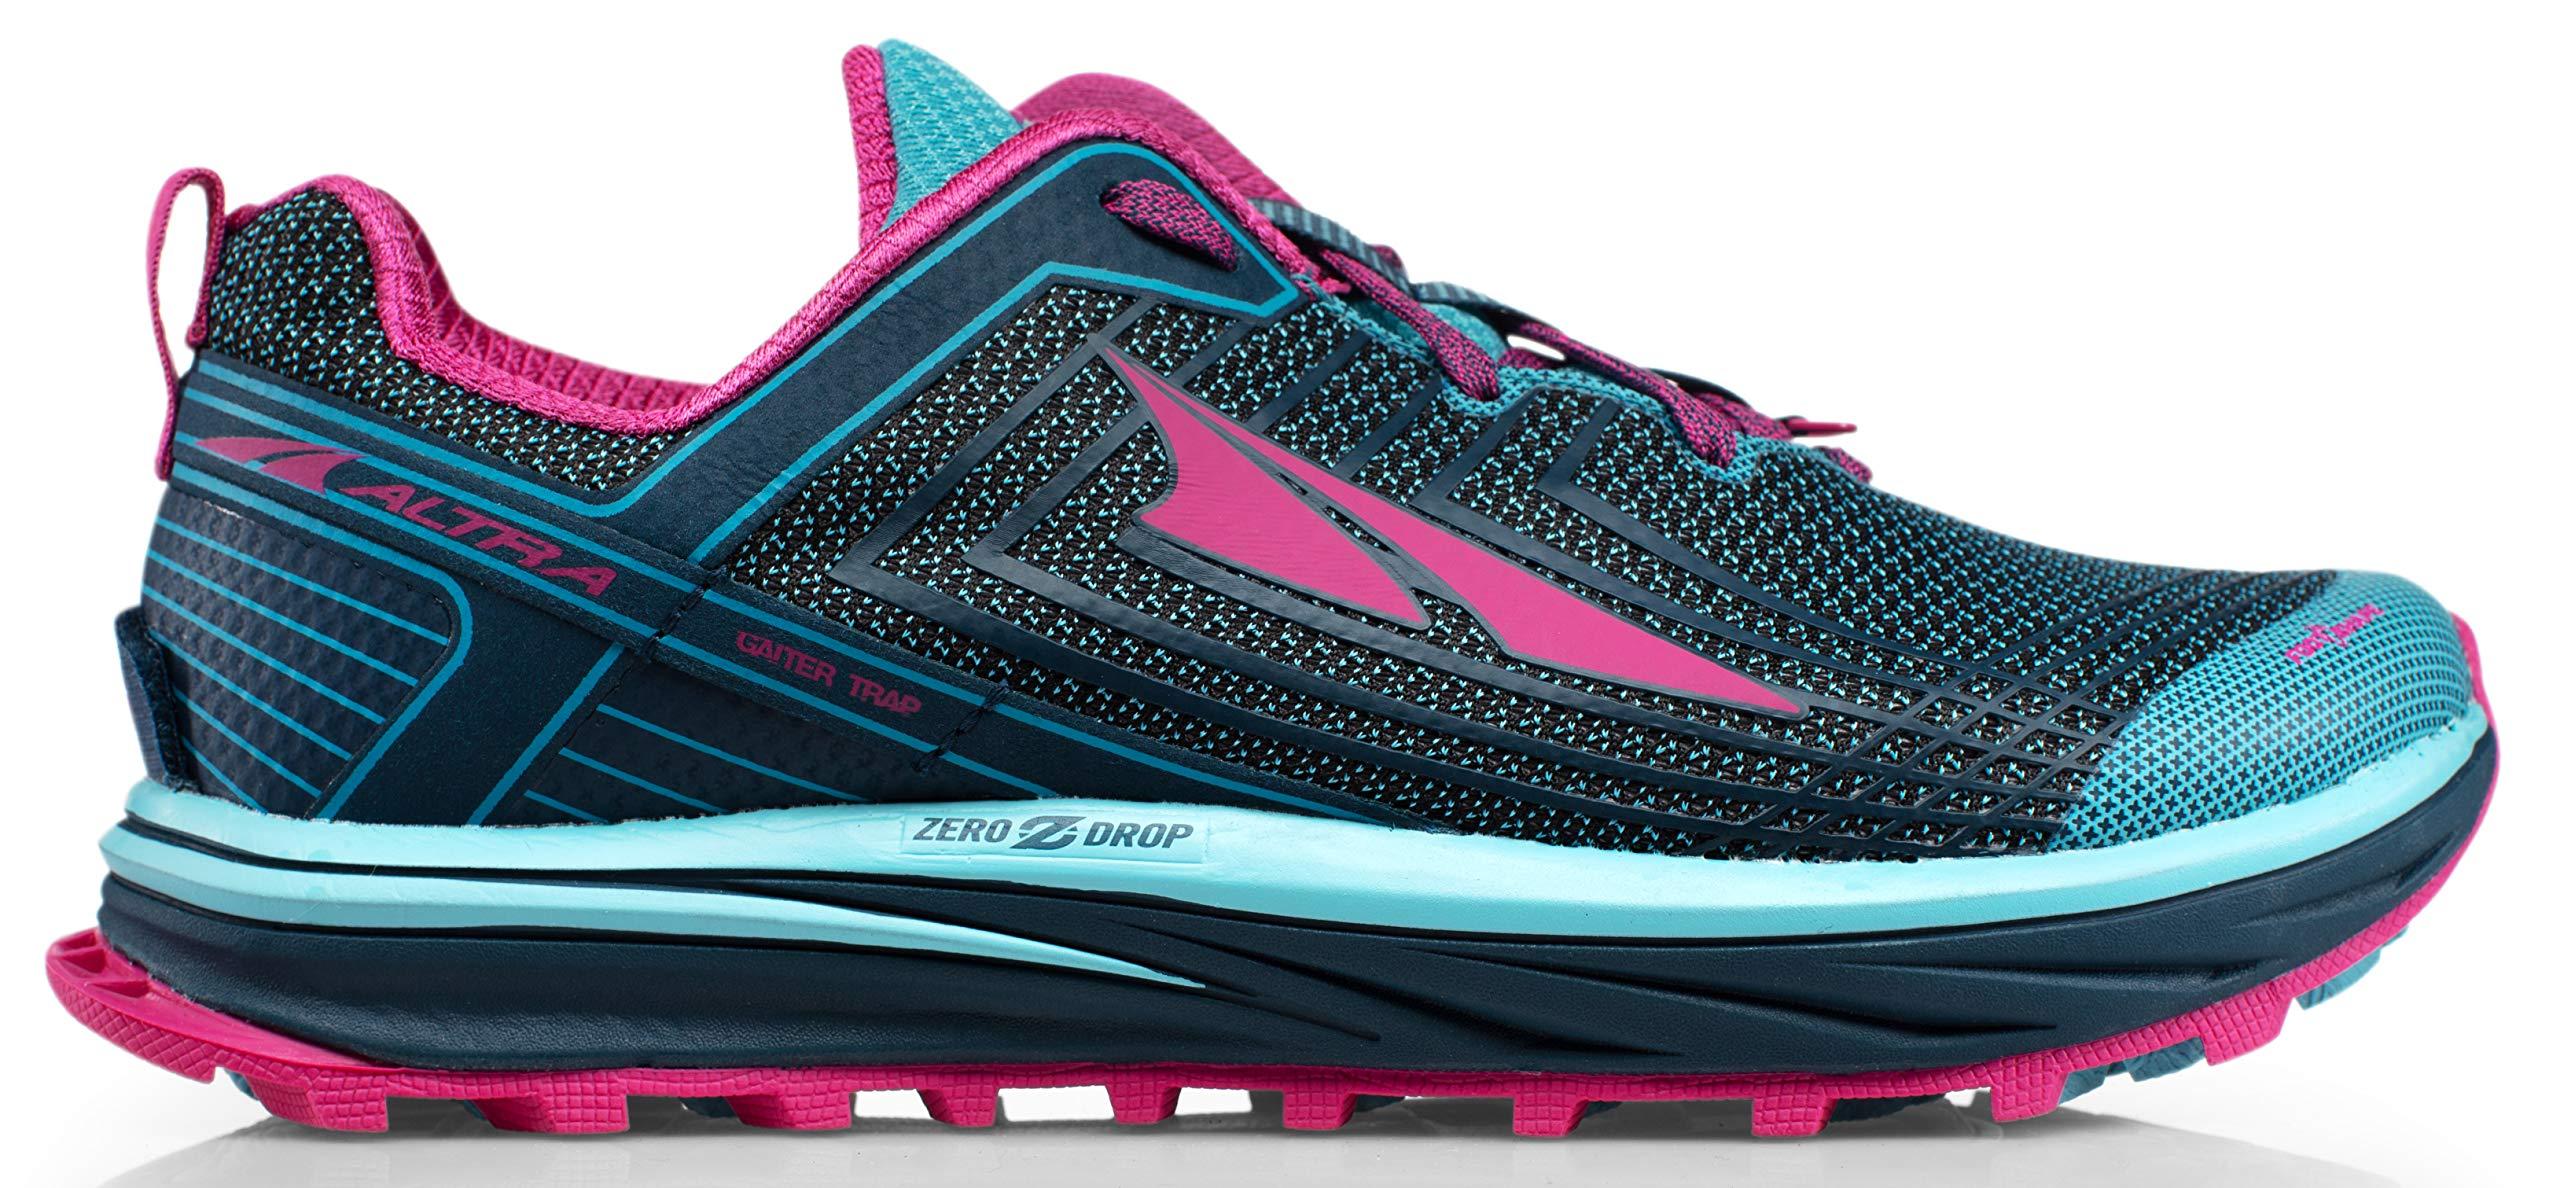 Altra AFW1957F Women's TIMP 1.5 Trail Running Shoe, Blue/Raspberry- 6 B(M) US